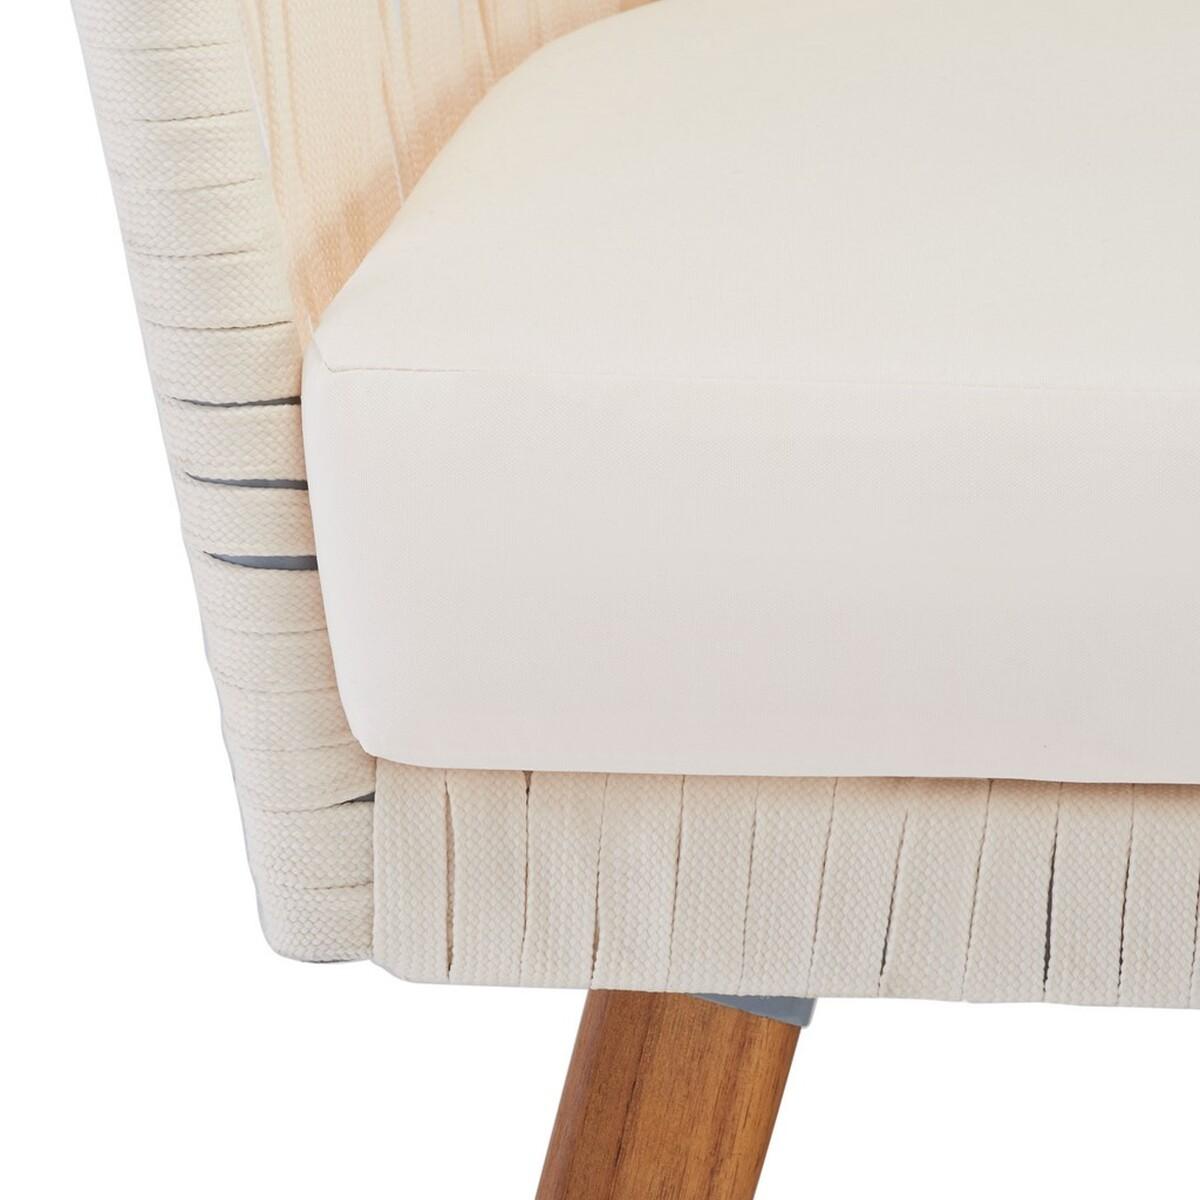 PAT7074D Patio Sets - 4 Piece - Furniture by Safavieh on Safavieh Ransin id=96234